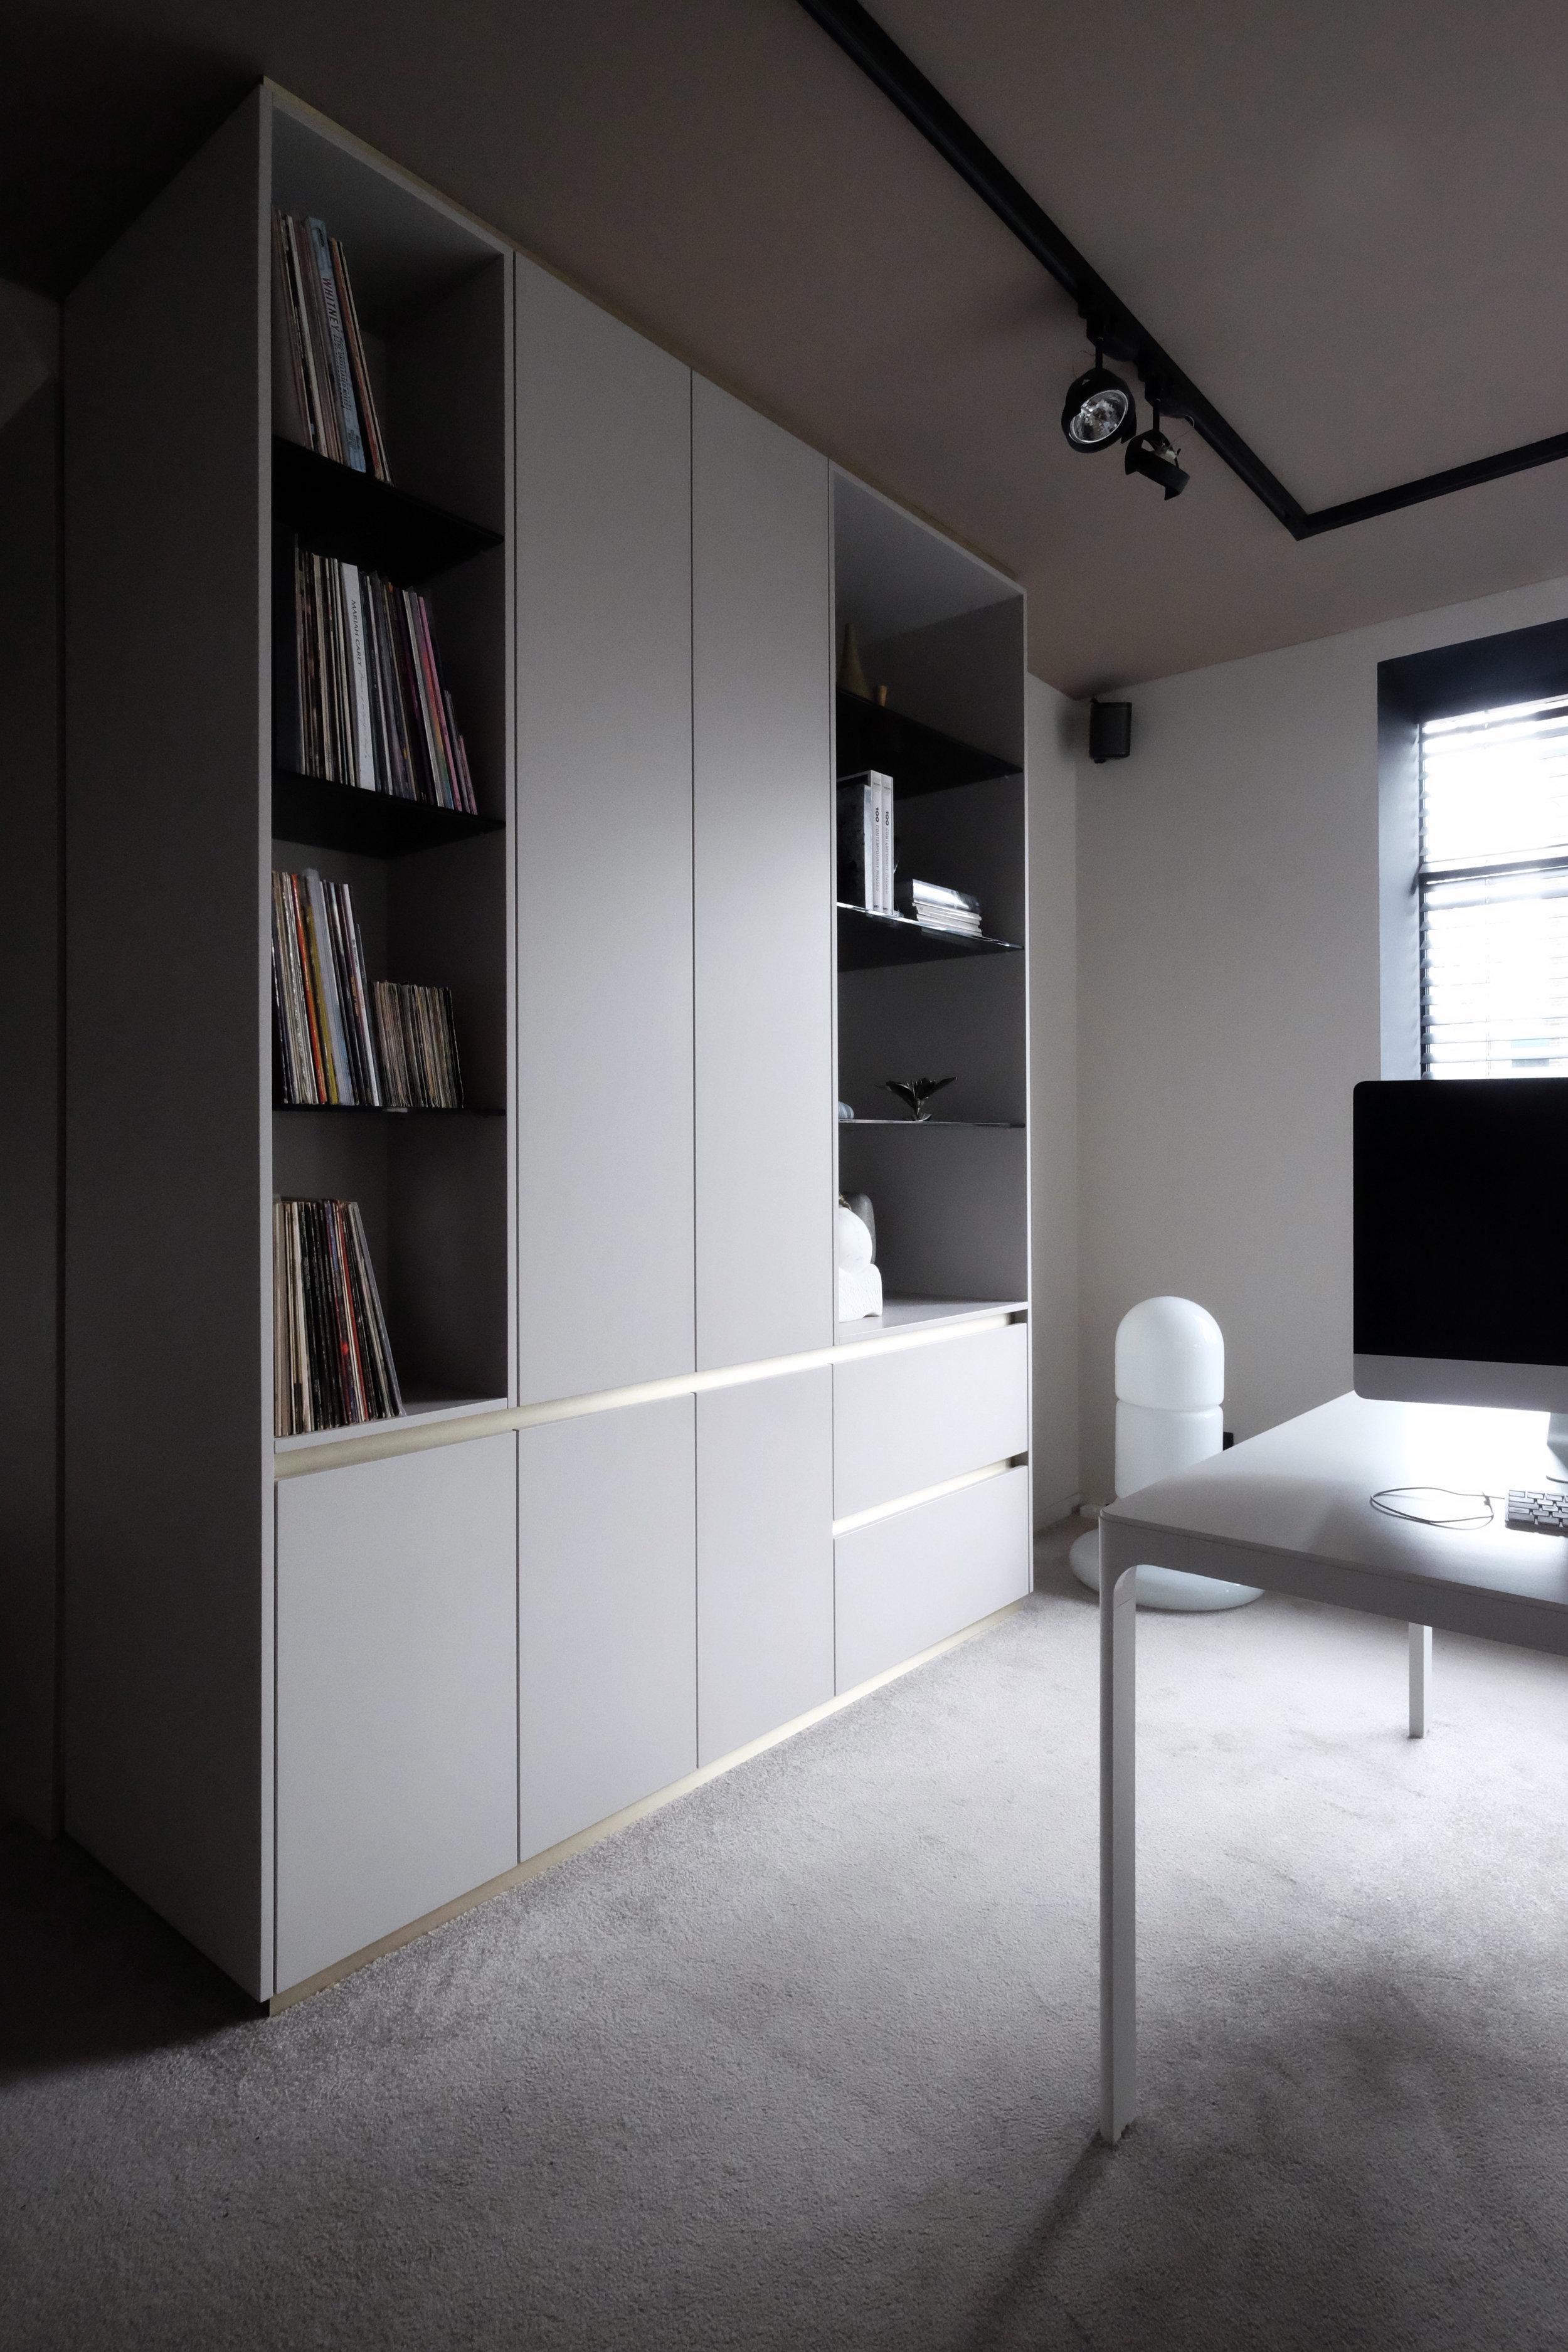 003 studio lex de gooijer interiors Rotterdam.jpg